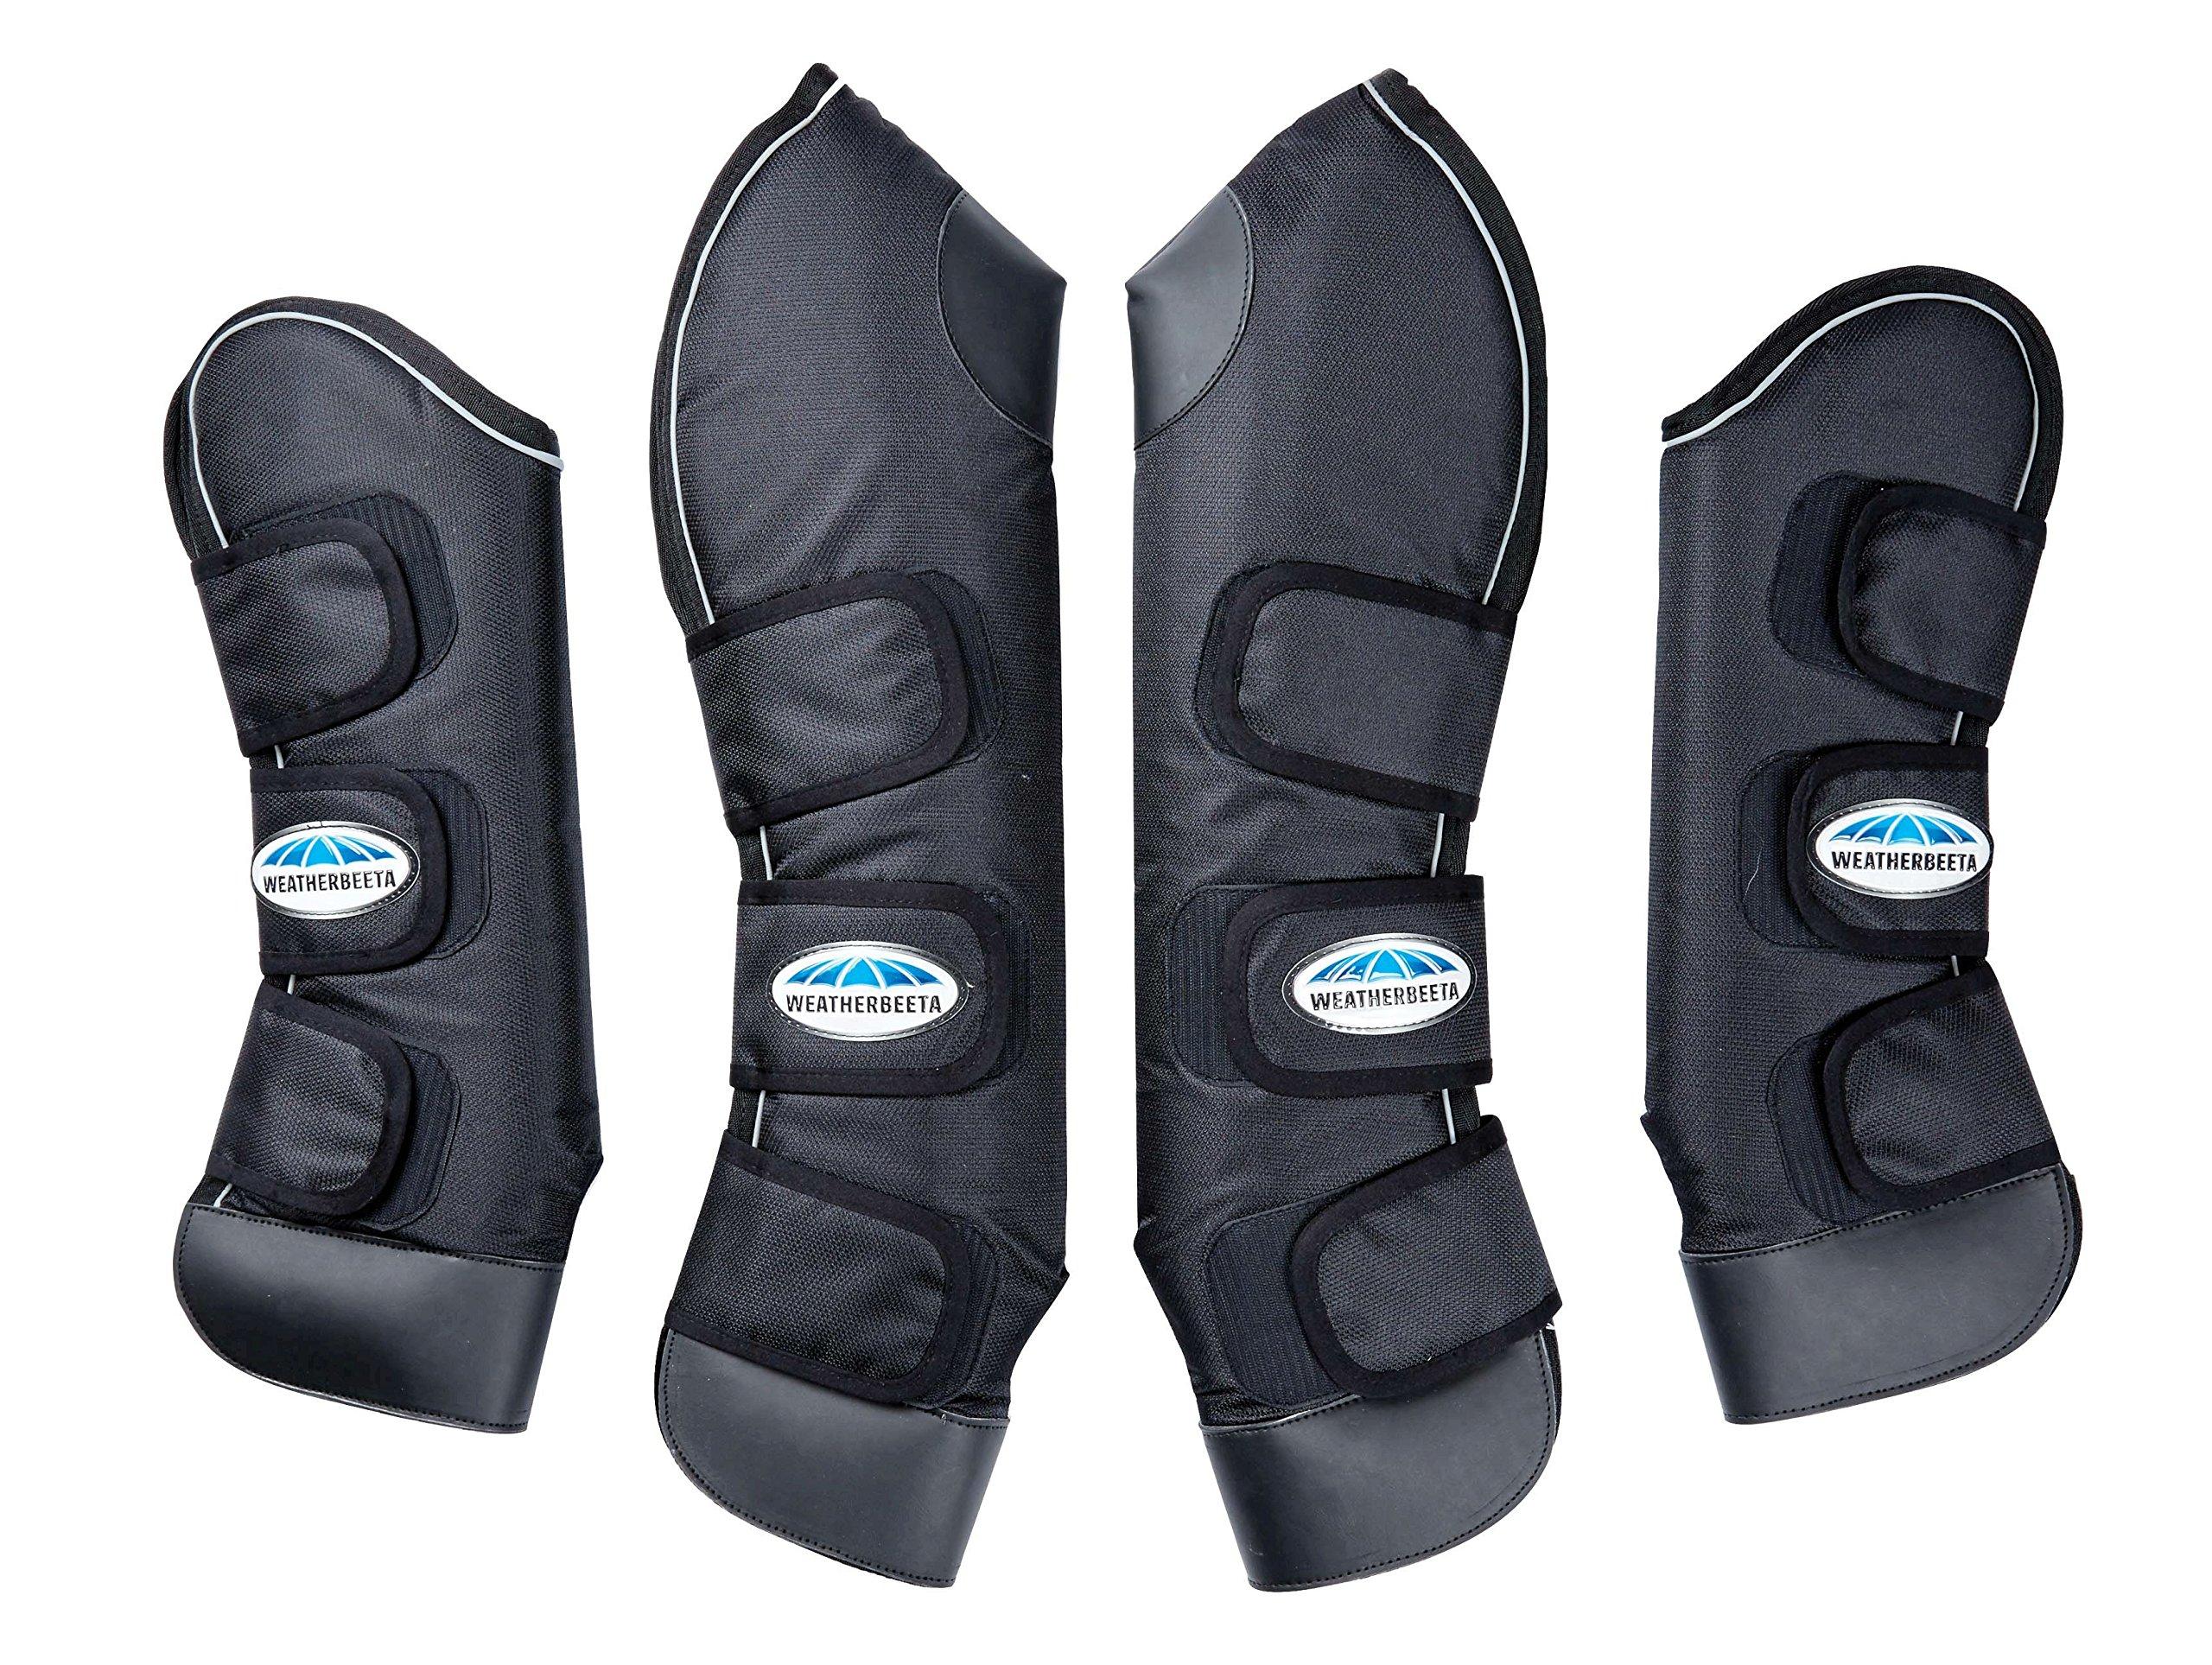 Weatherbeeta Deluxe Travel Boots (Full) by Weatherbeeta